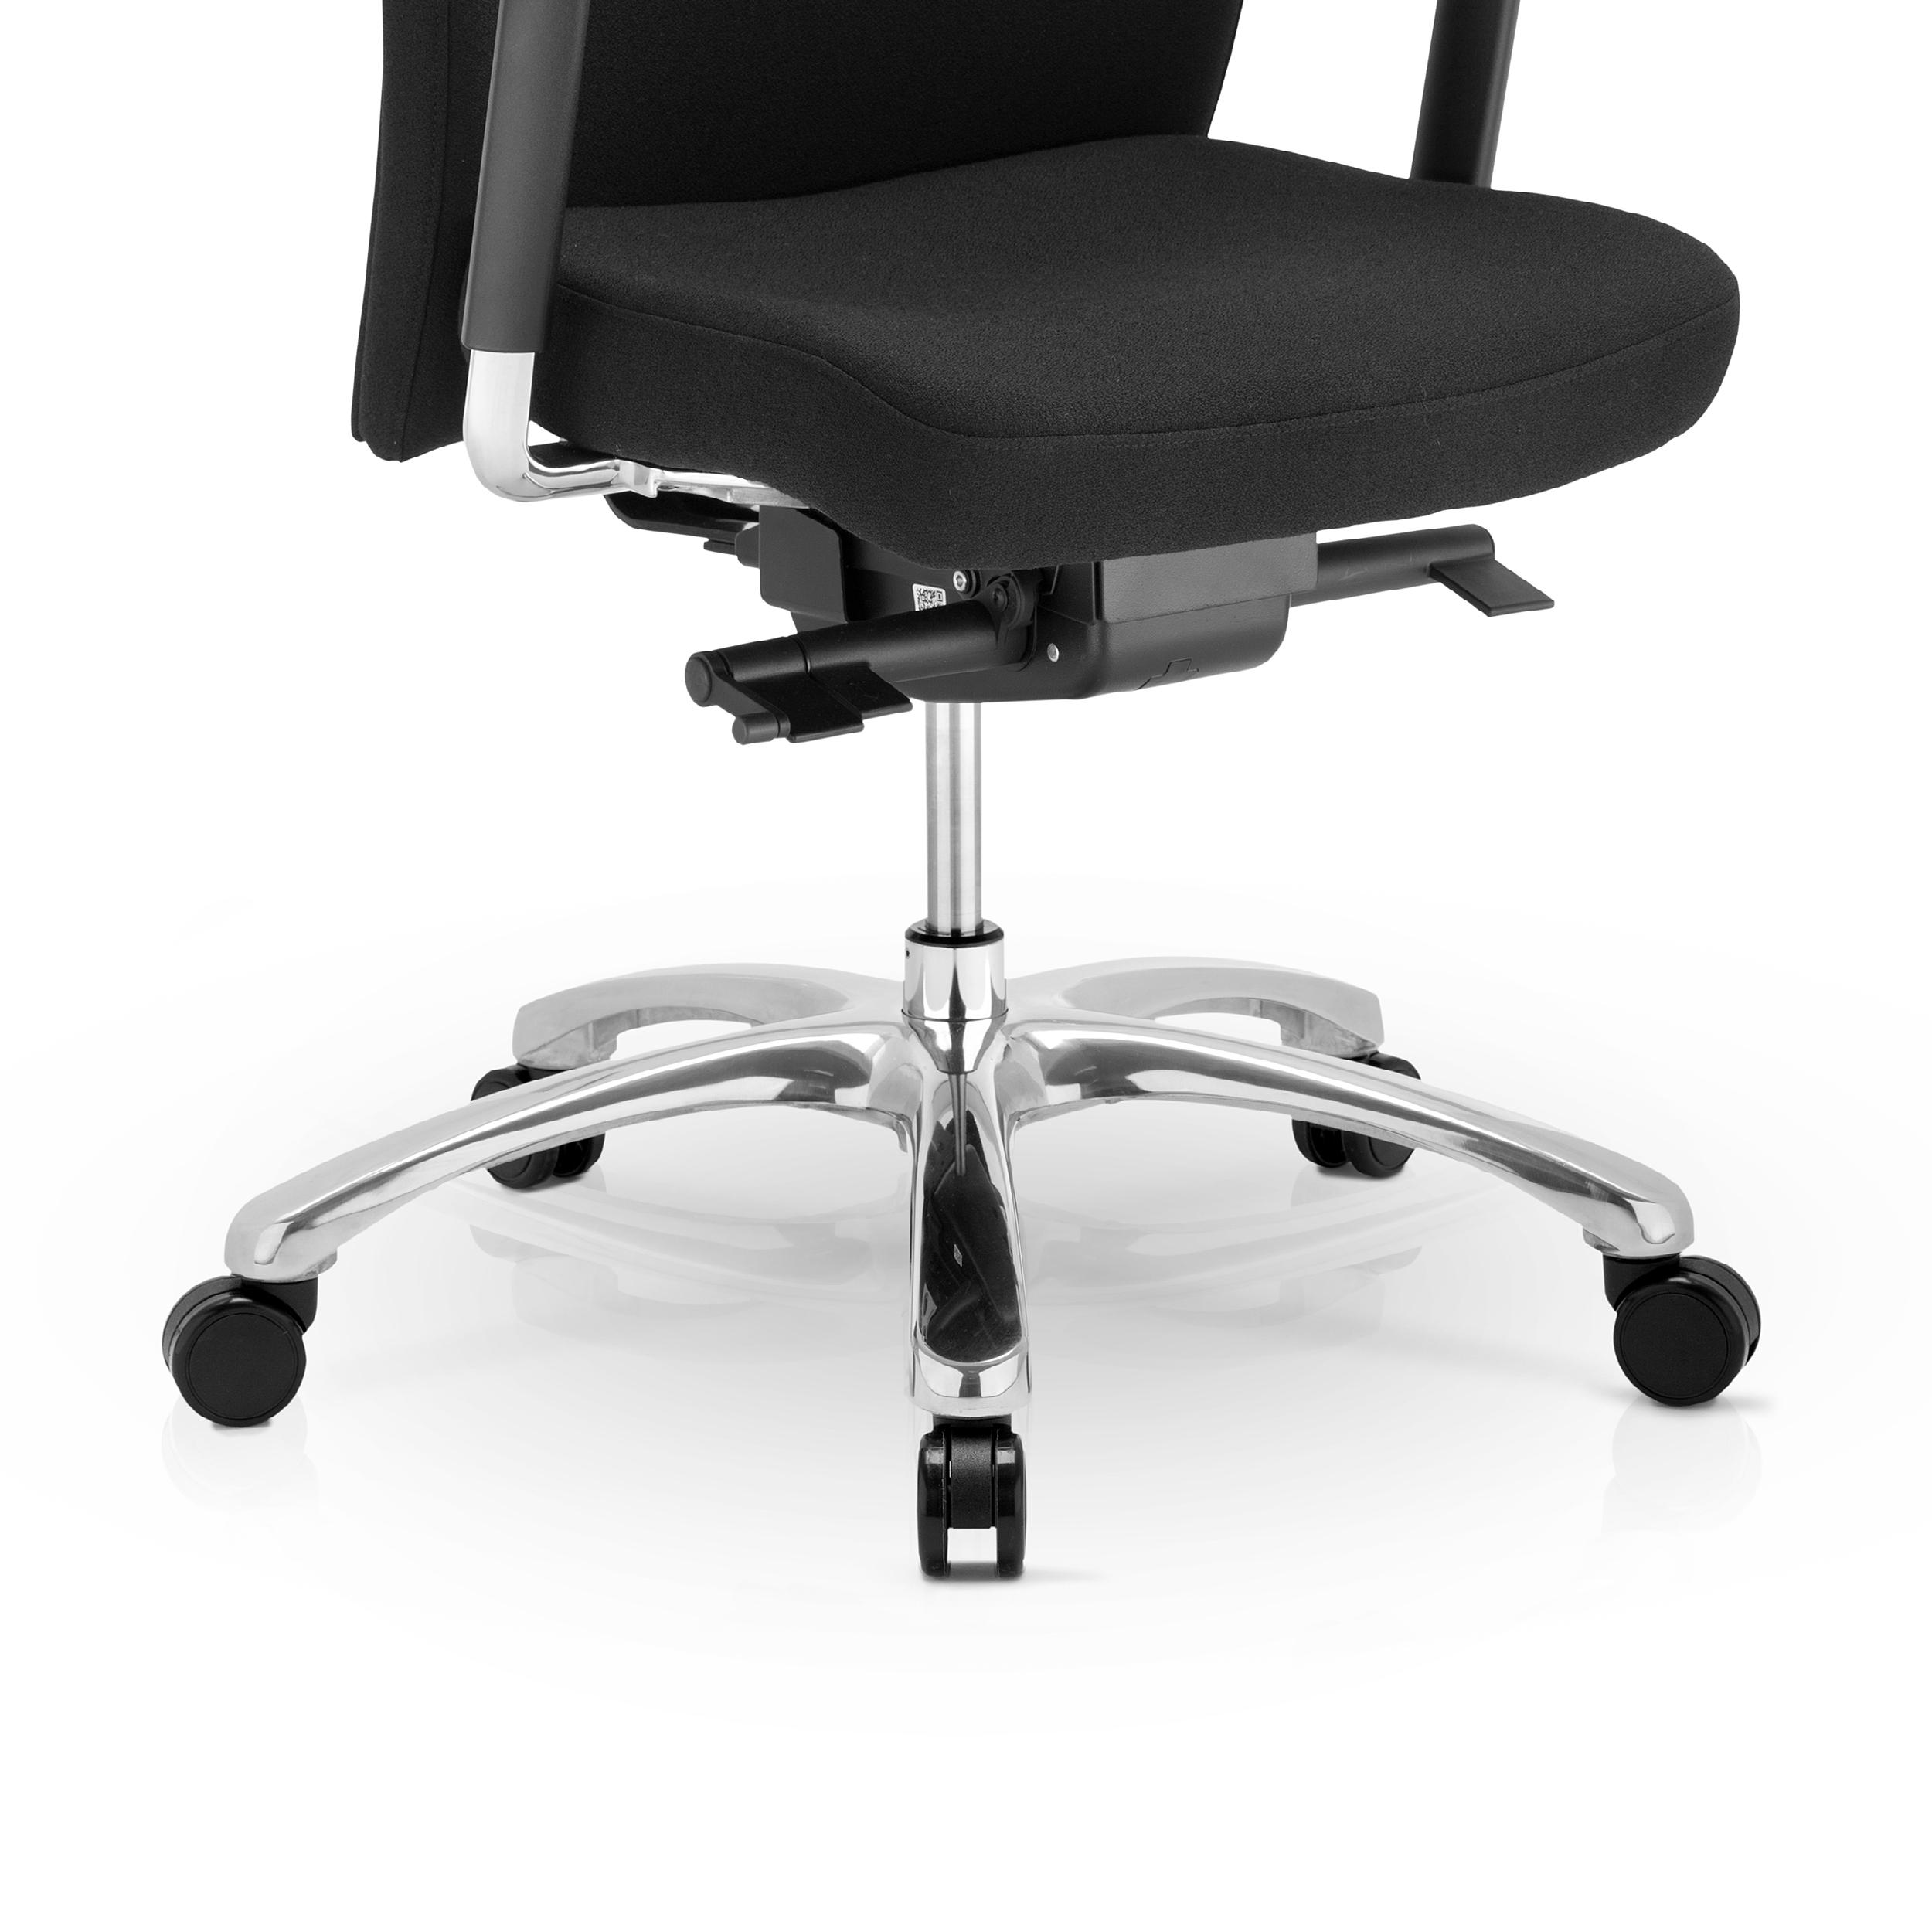 office-chairs_1-1_Orlando-3.jpg